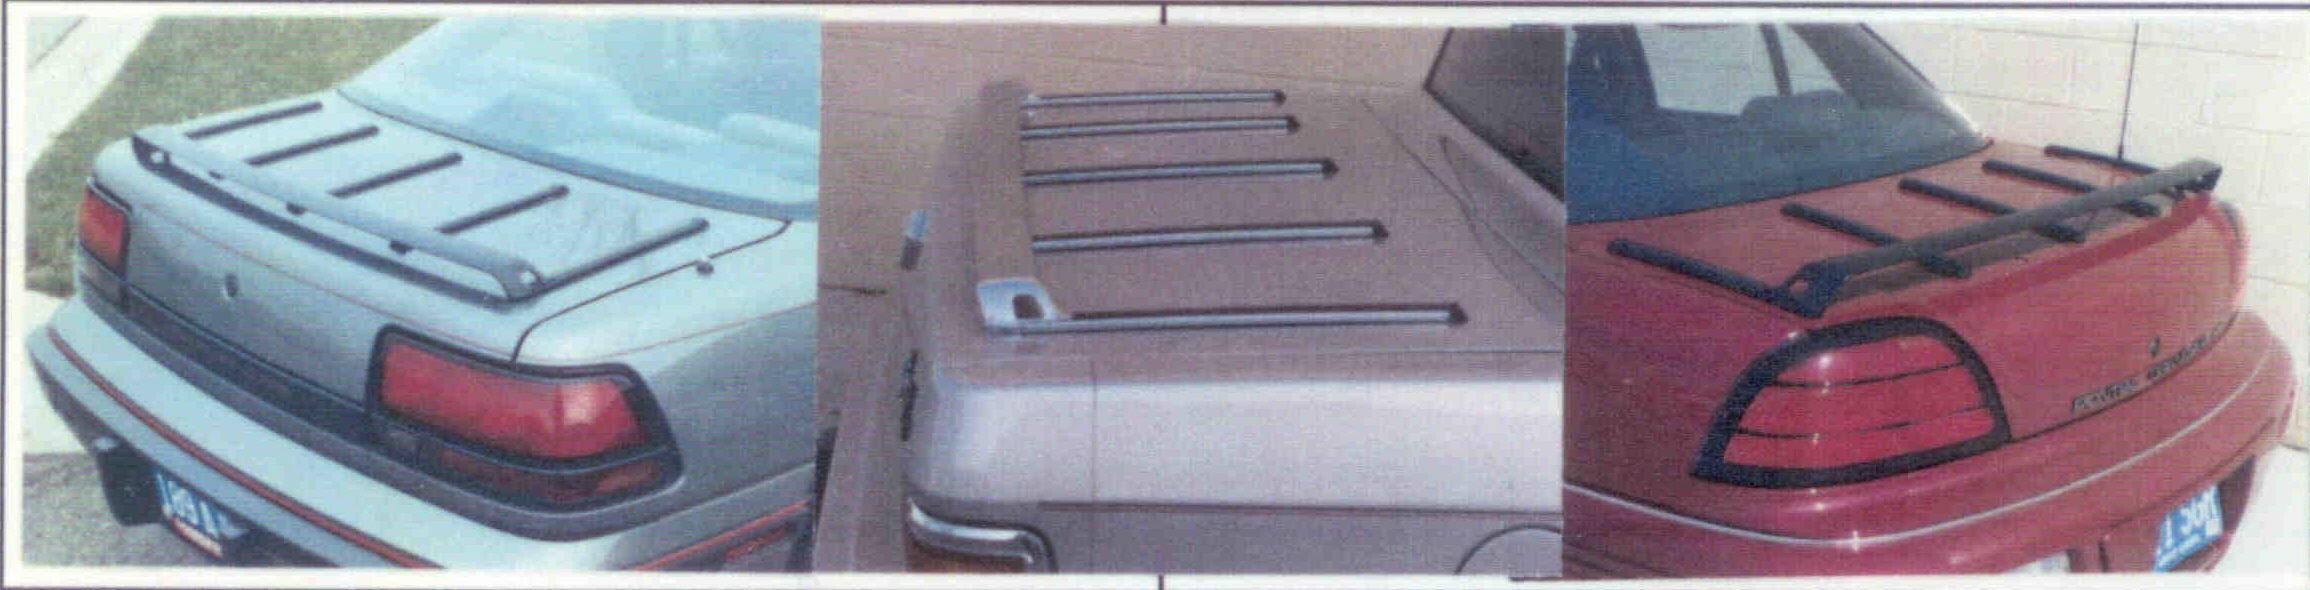 RackMaster Aero Series